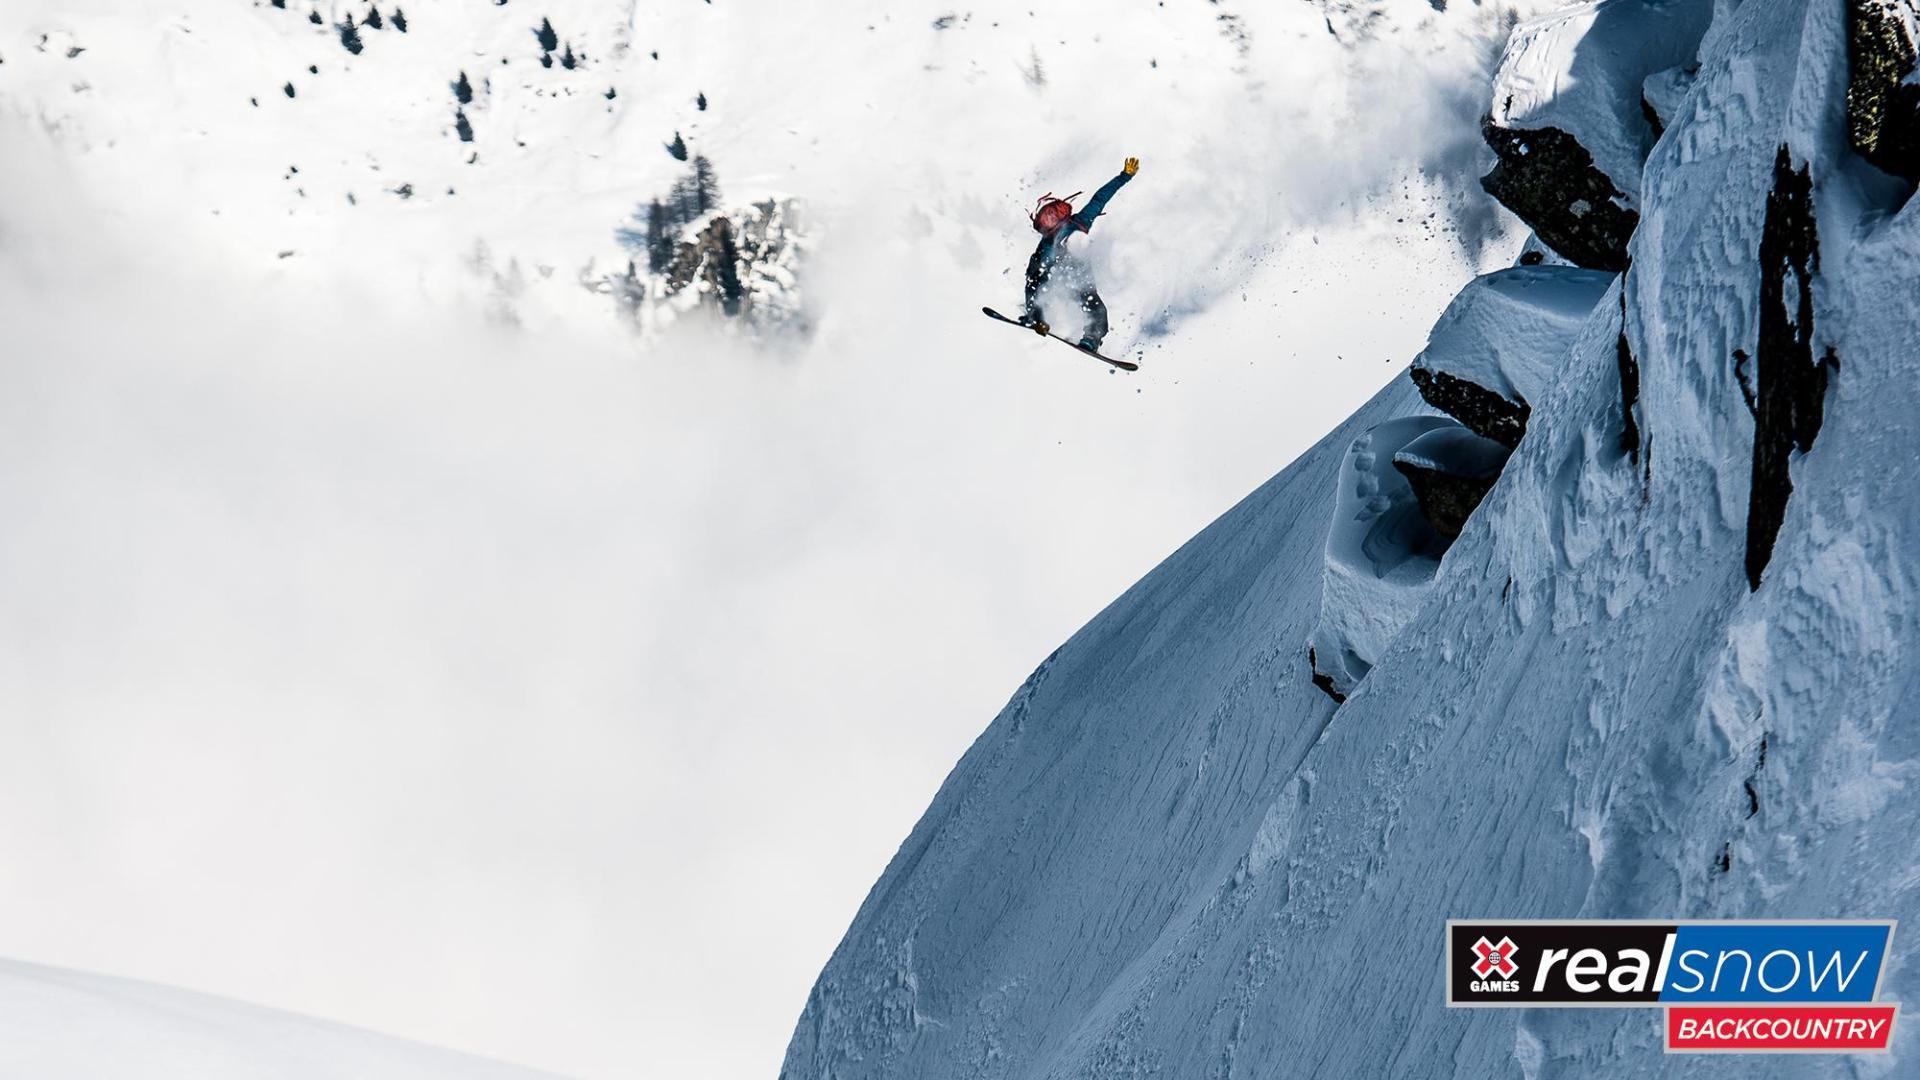 John Jackson wins Real Snow Backcountry 2015 gold